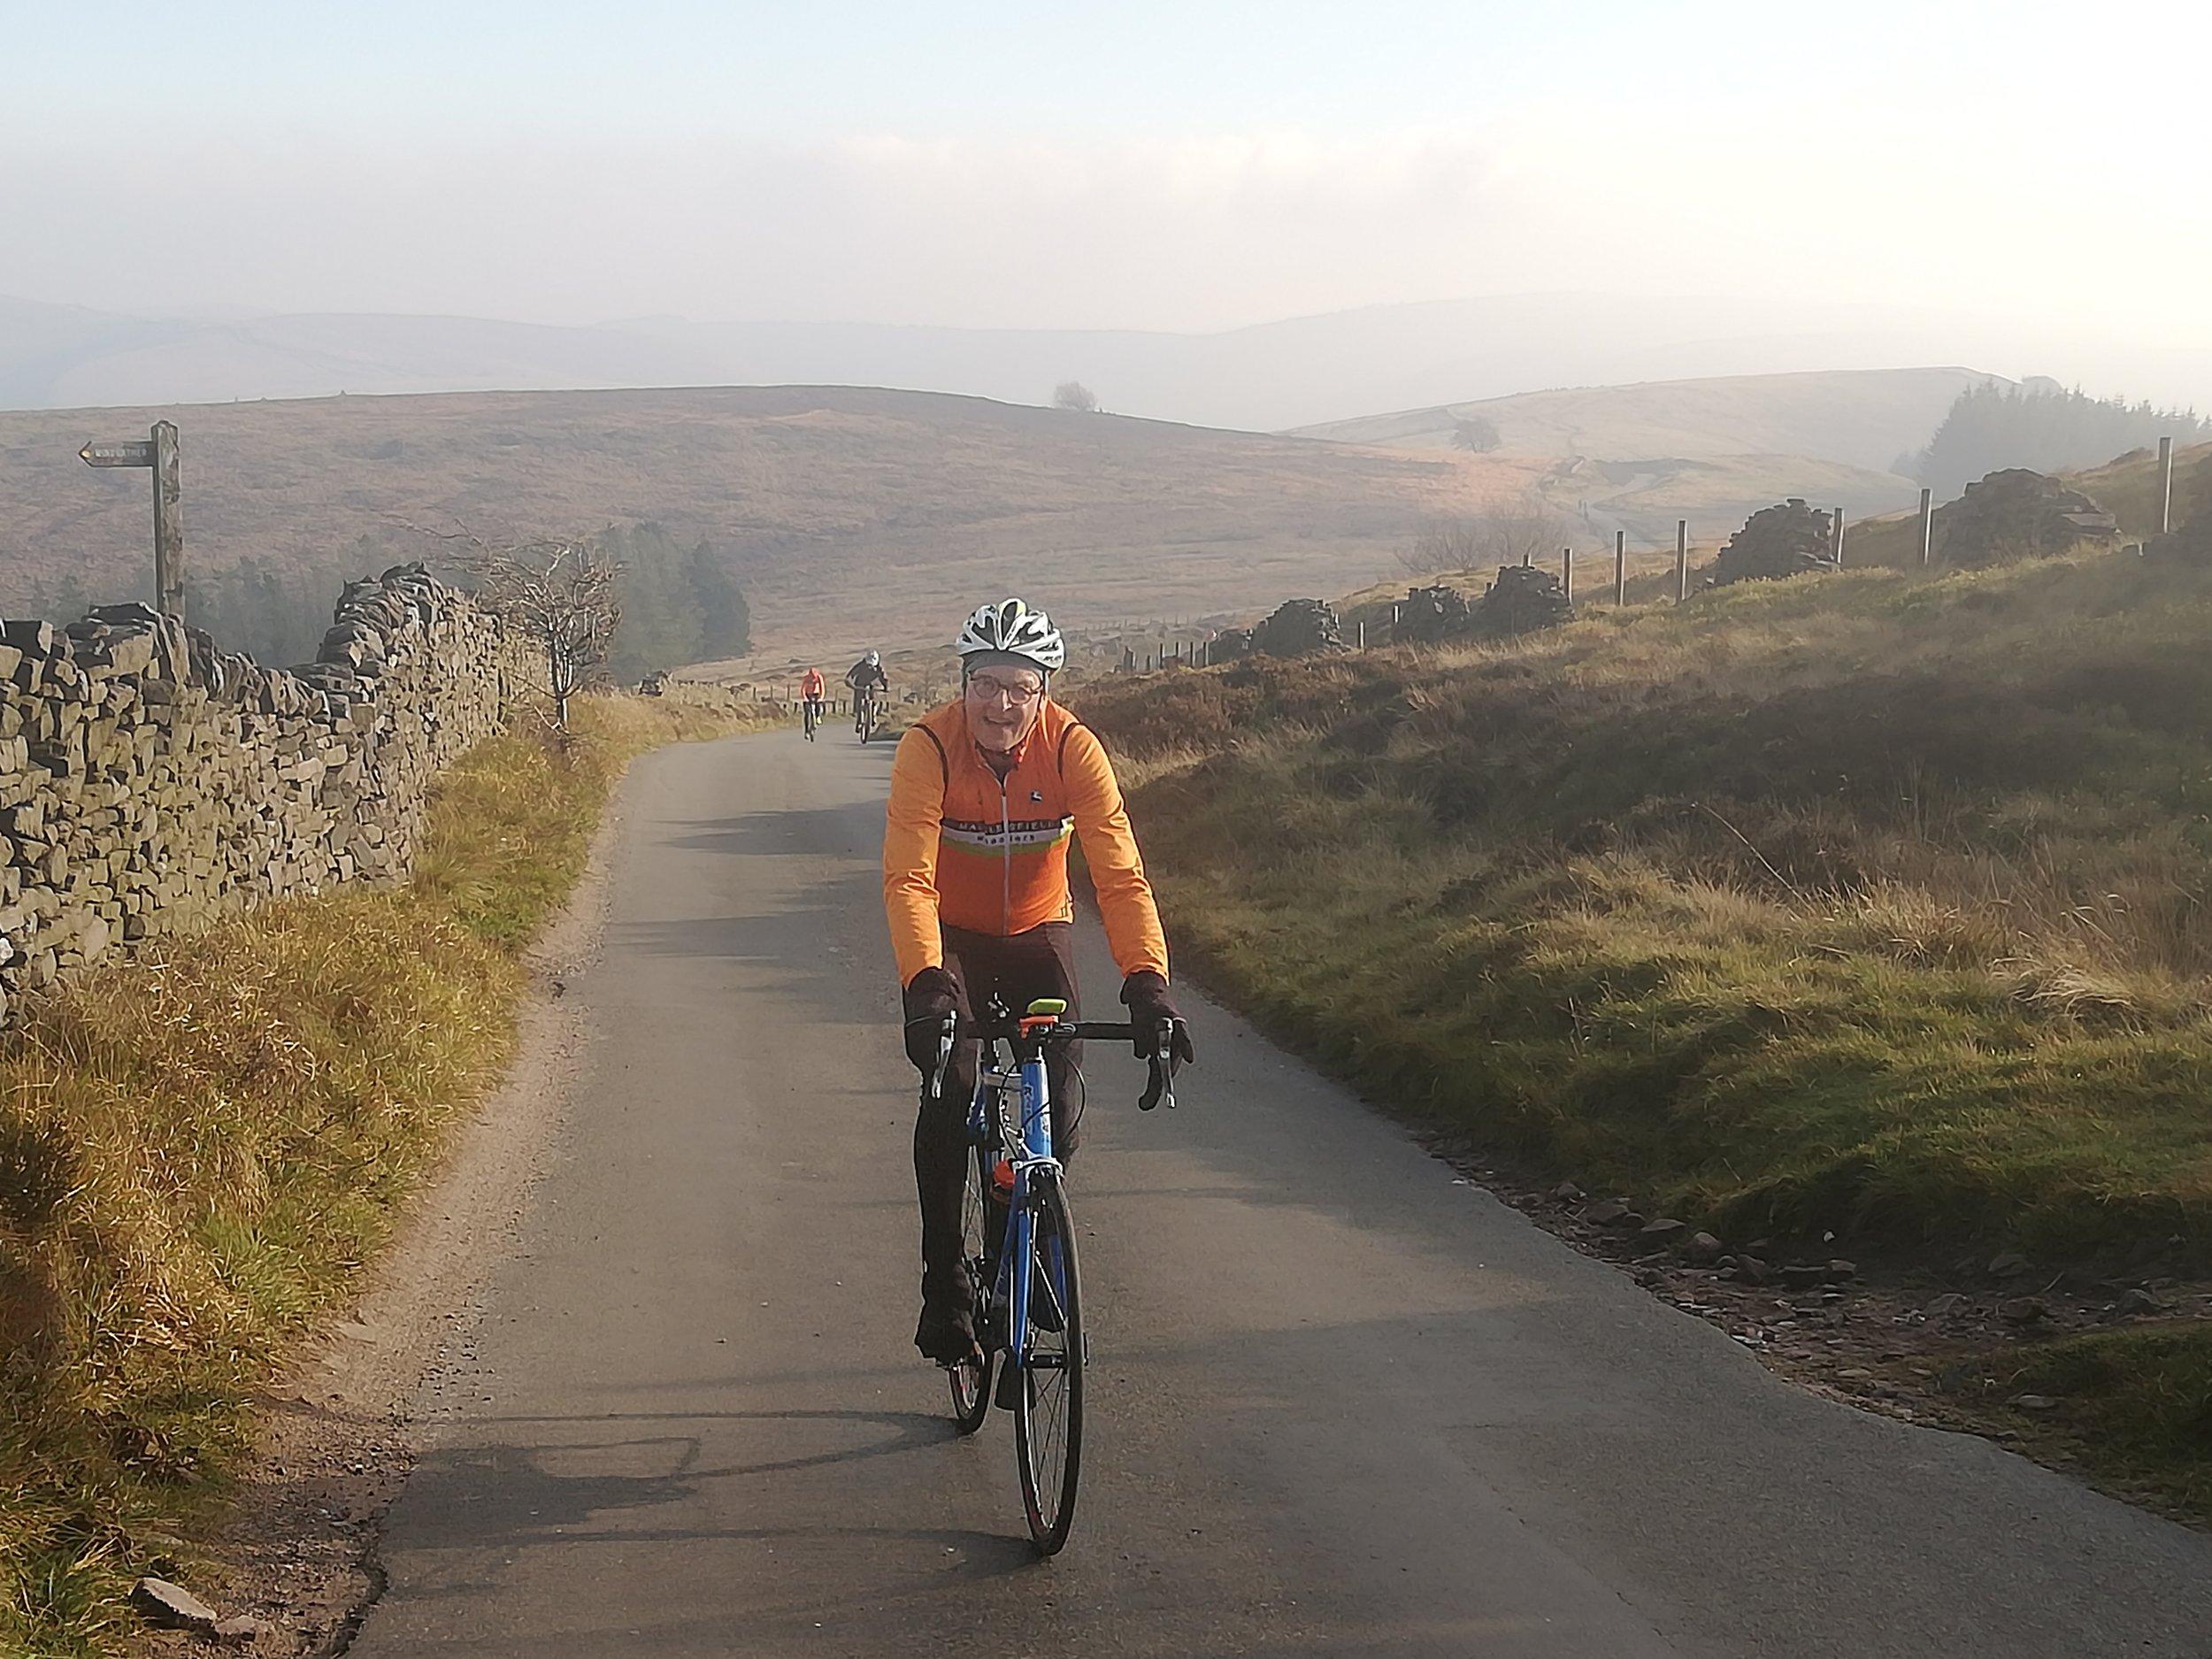 Ride Leader smug that he has overtaken a Mountain Biker on The Street.